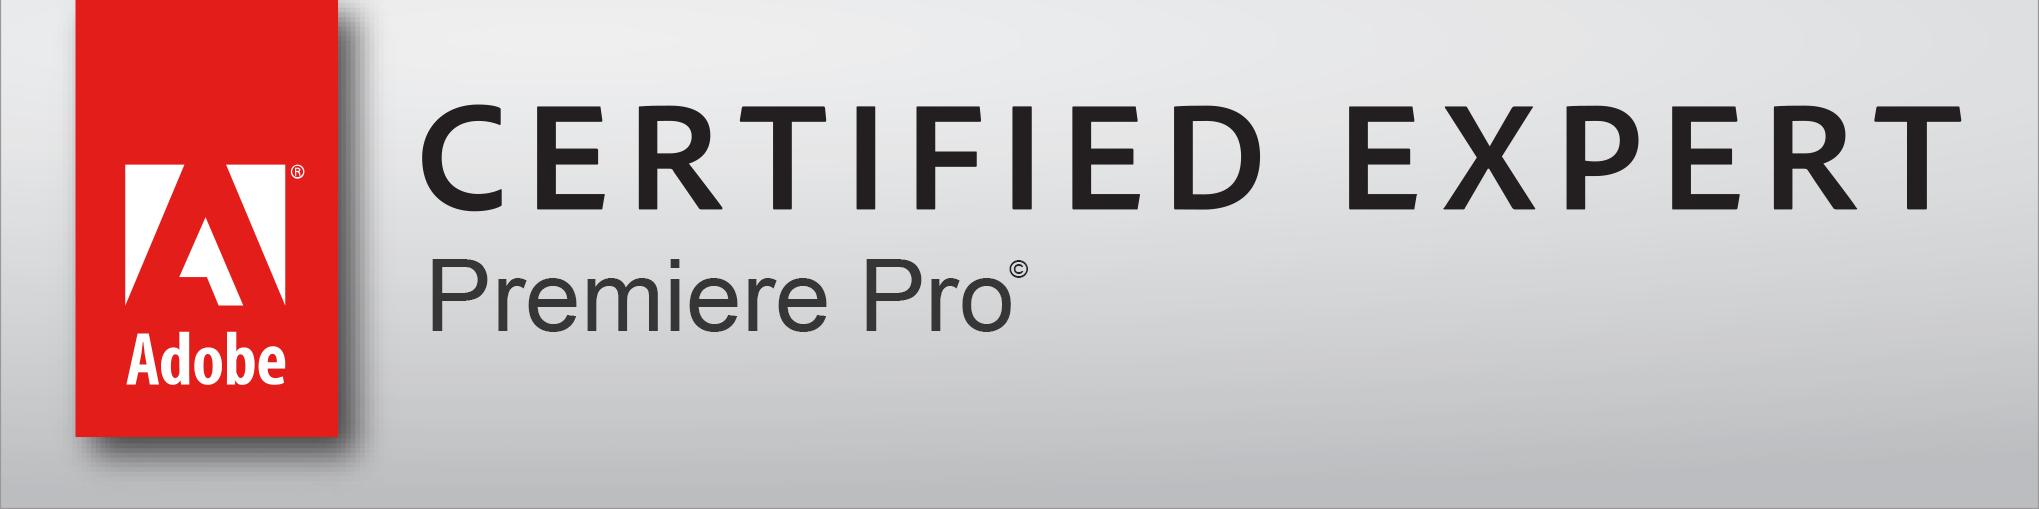 Adobe+Certified+Expert.jpg